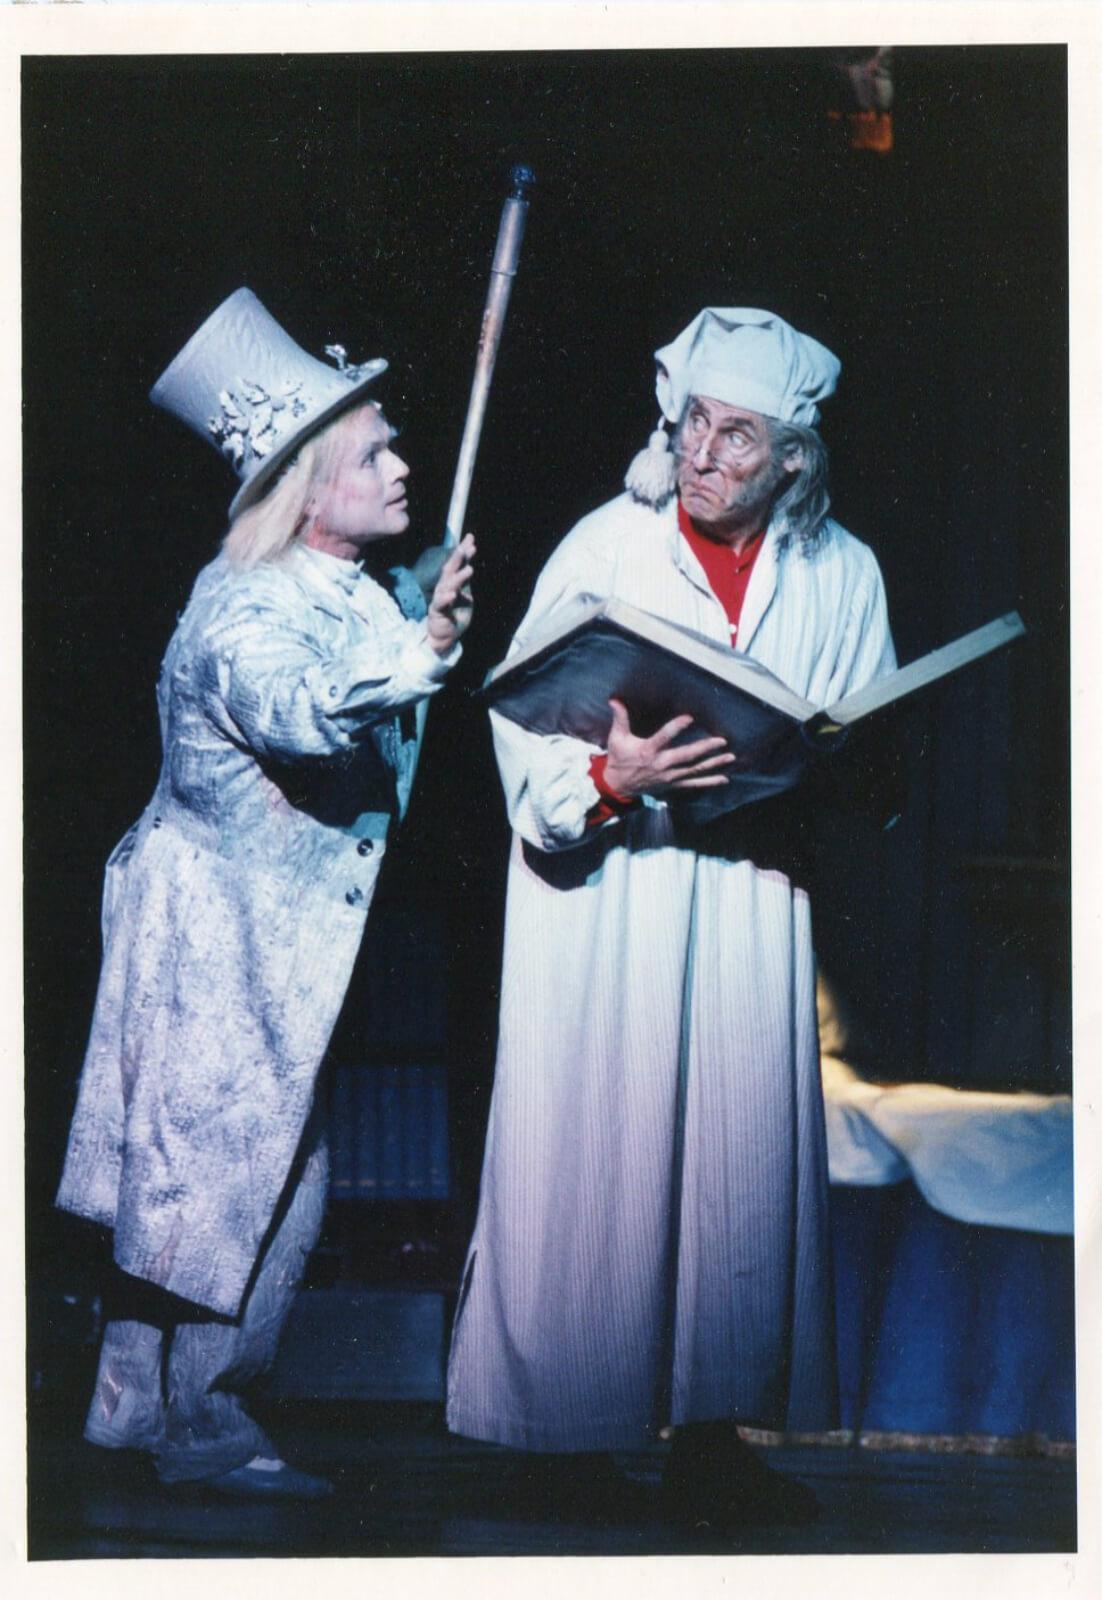 Ghost of Christmas Past (Ken Jennings) visits Ebenezer Scrooge (Roger Daltry).